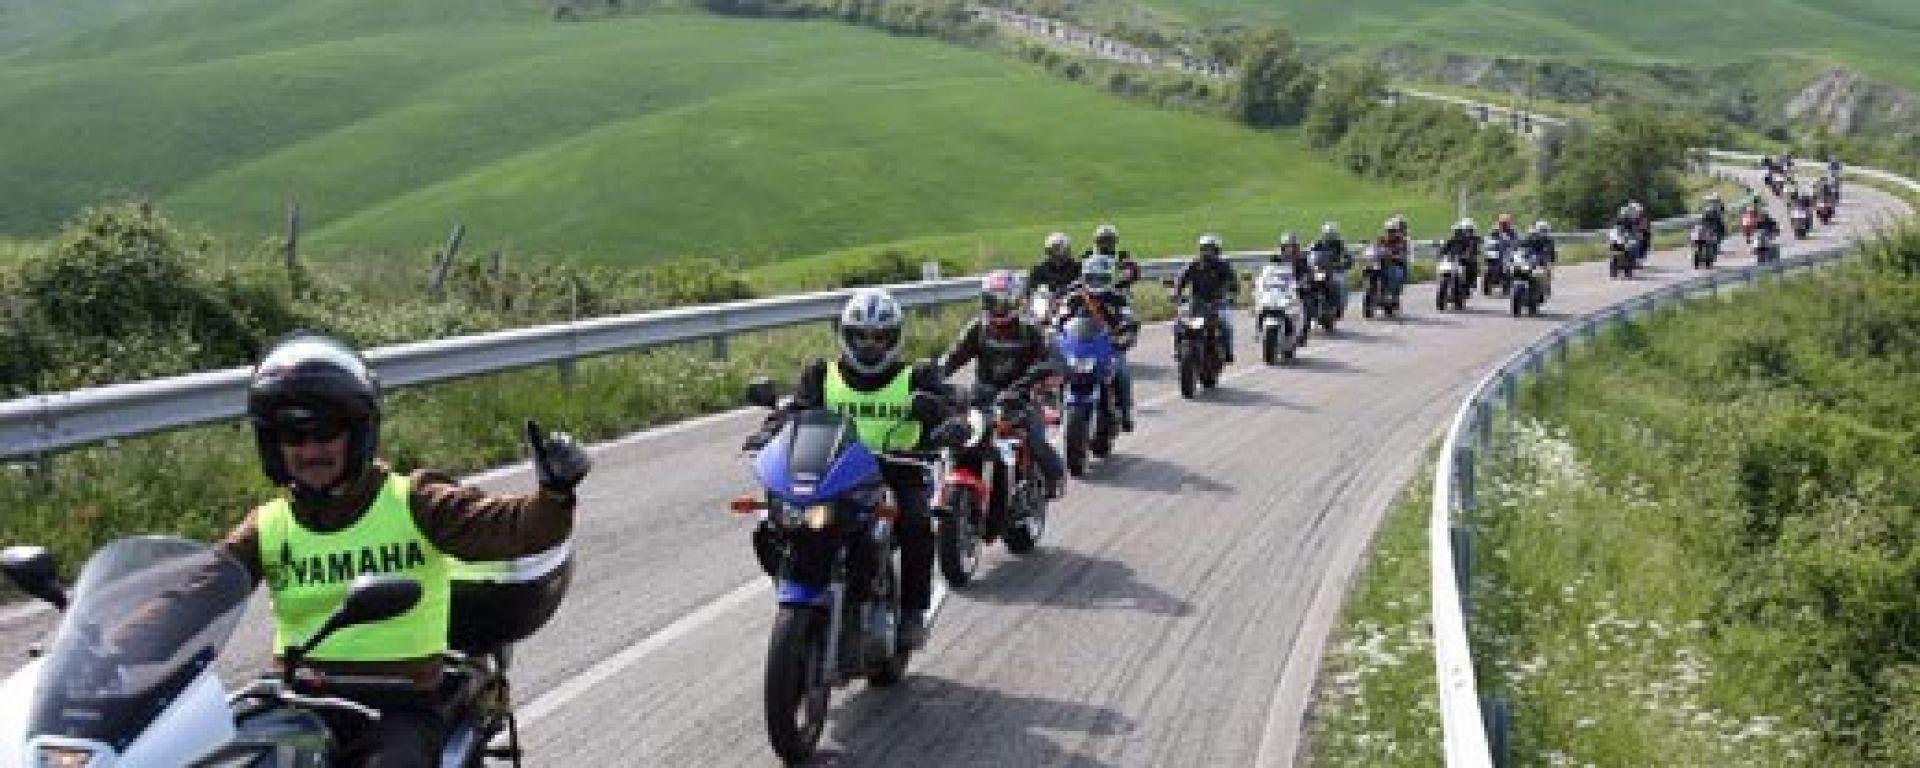 YAMAHA: Terre di Siena Ride 2006